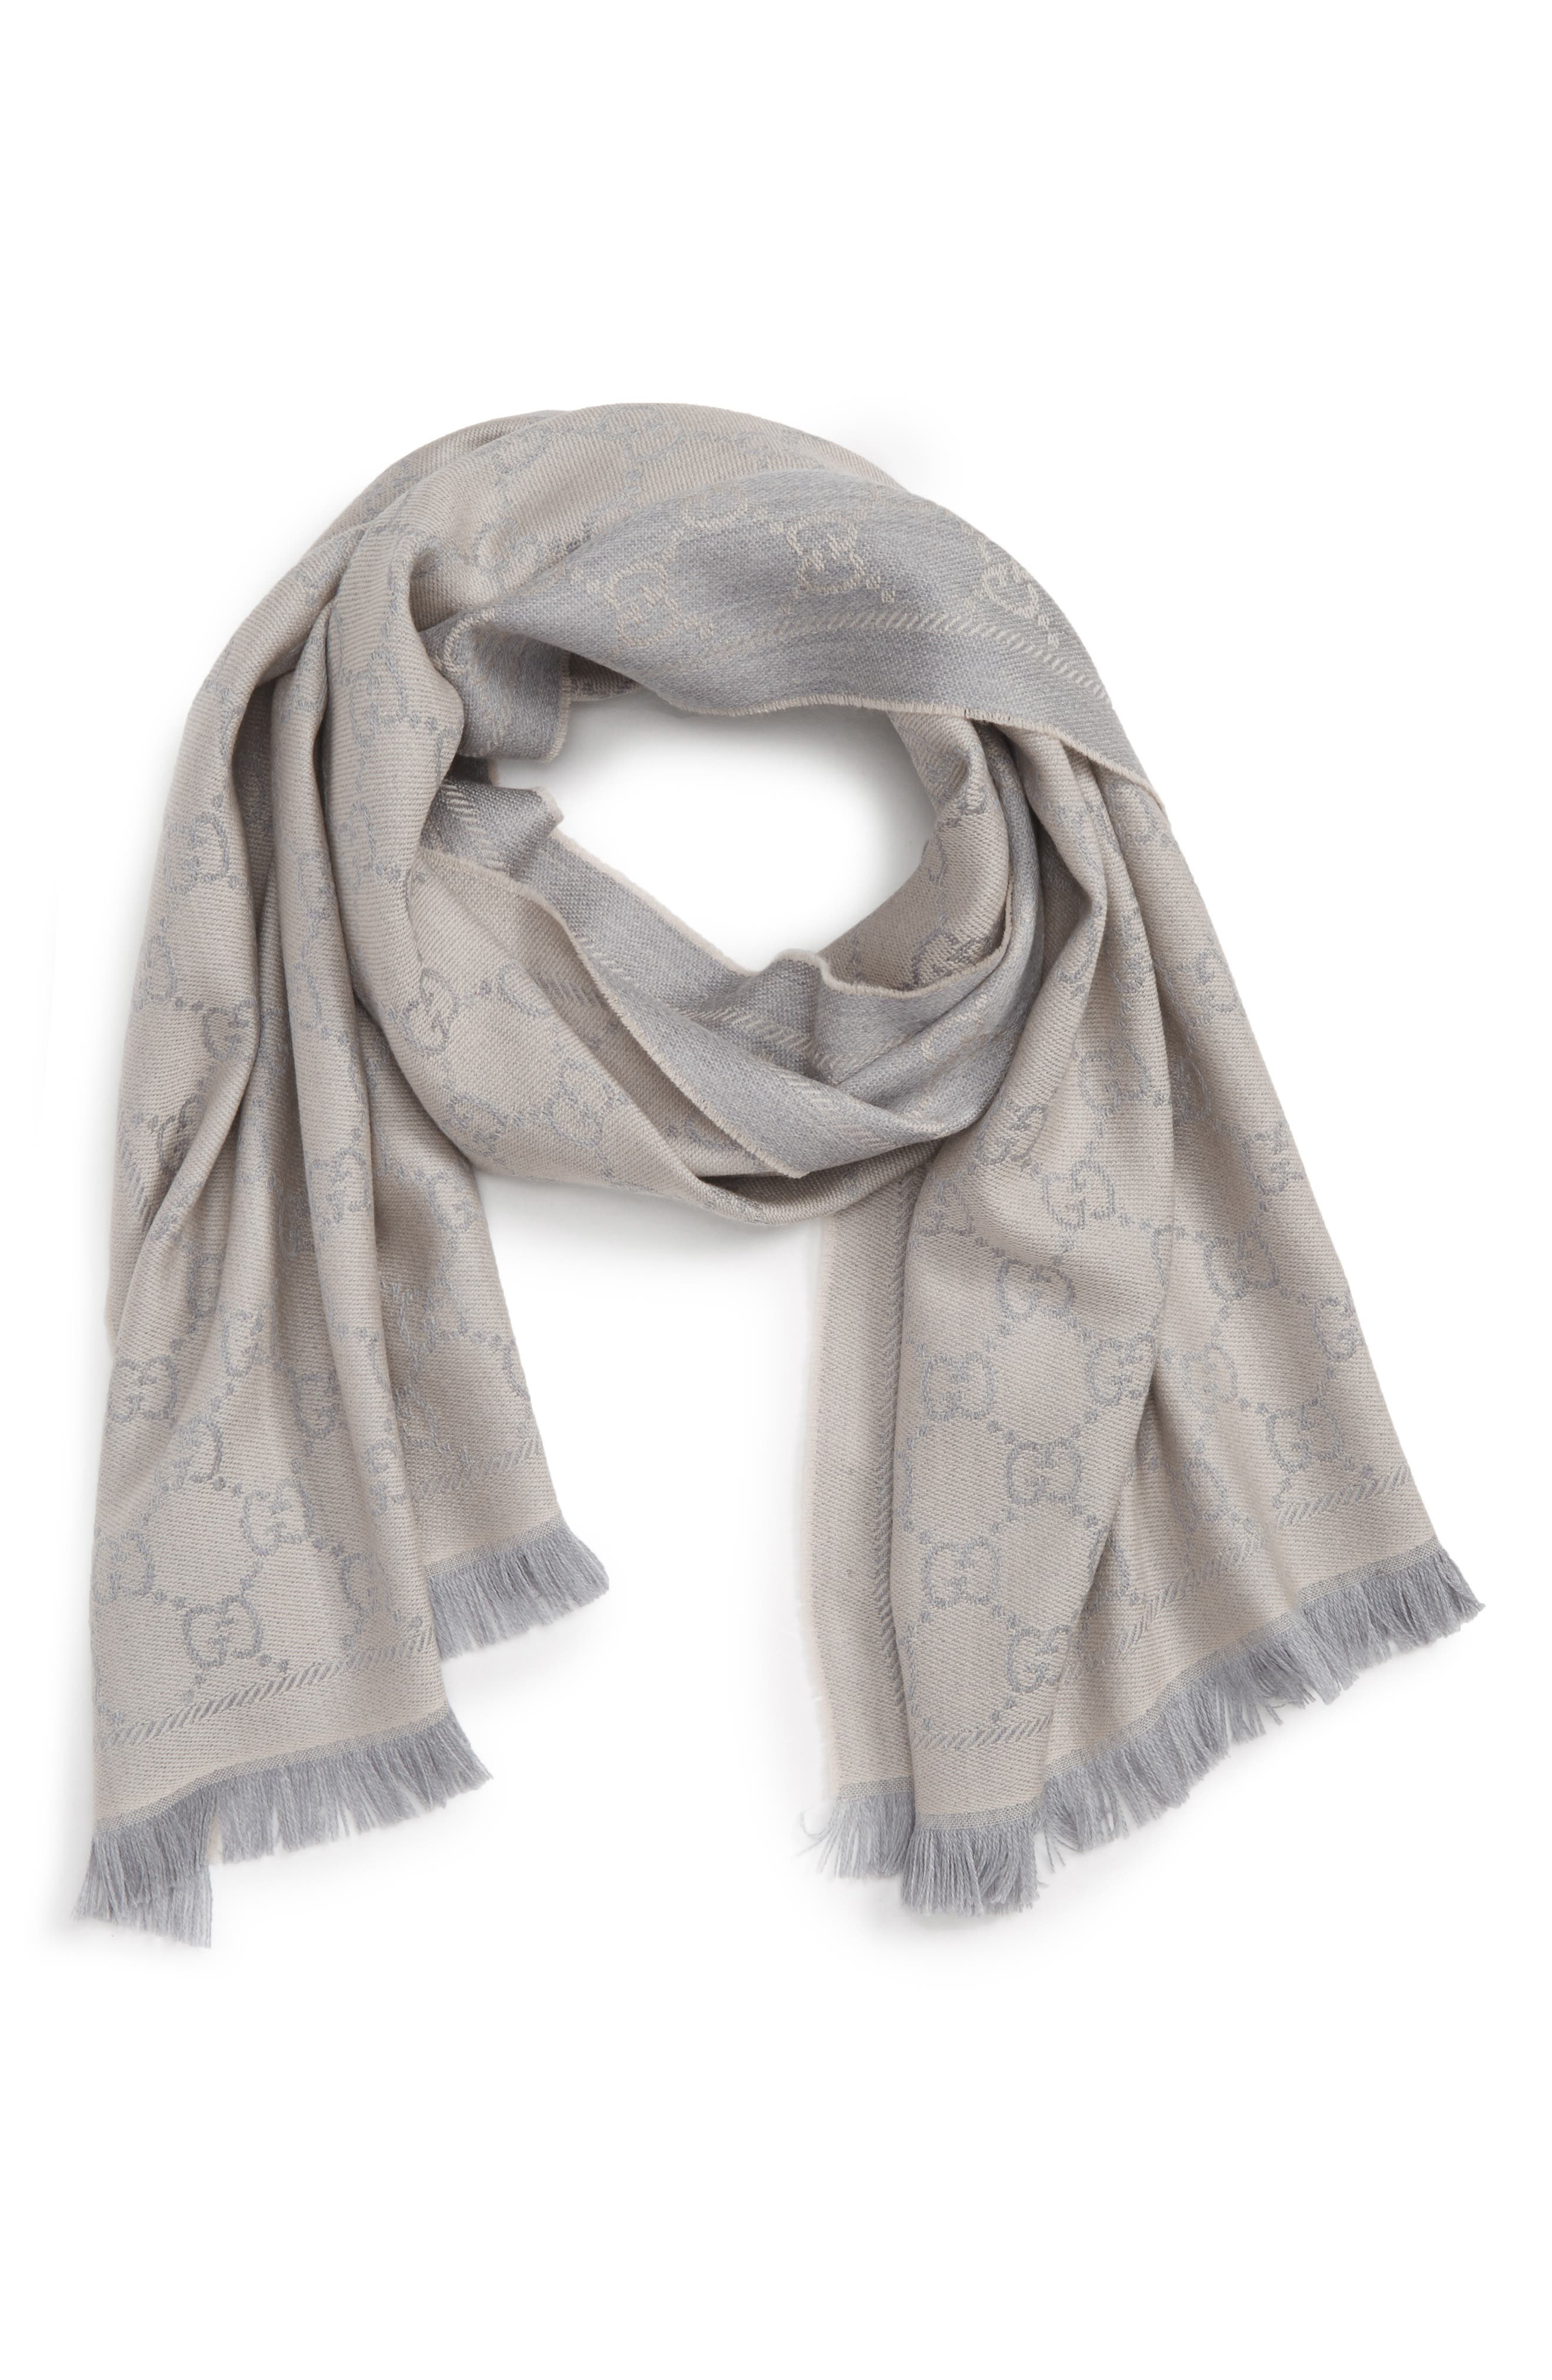 GG Jacquard Wool Scarf,                         Main,                         color, 1763 Zinc/Ight Grey